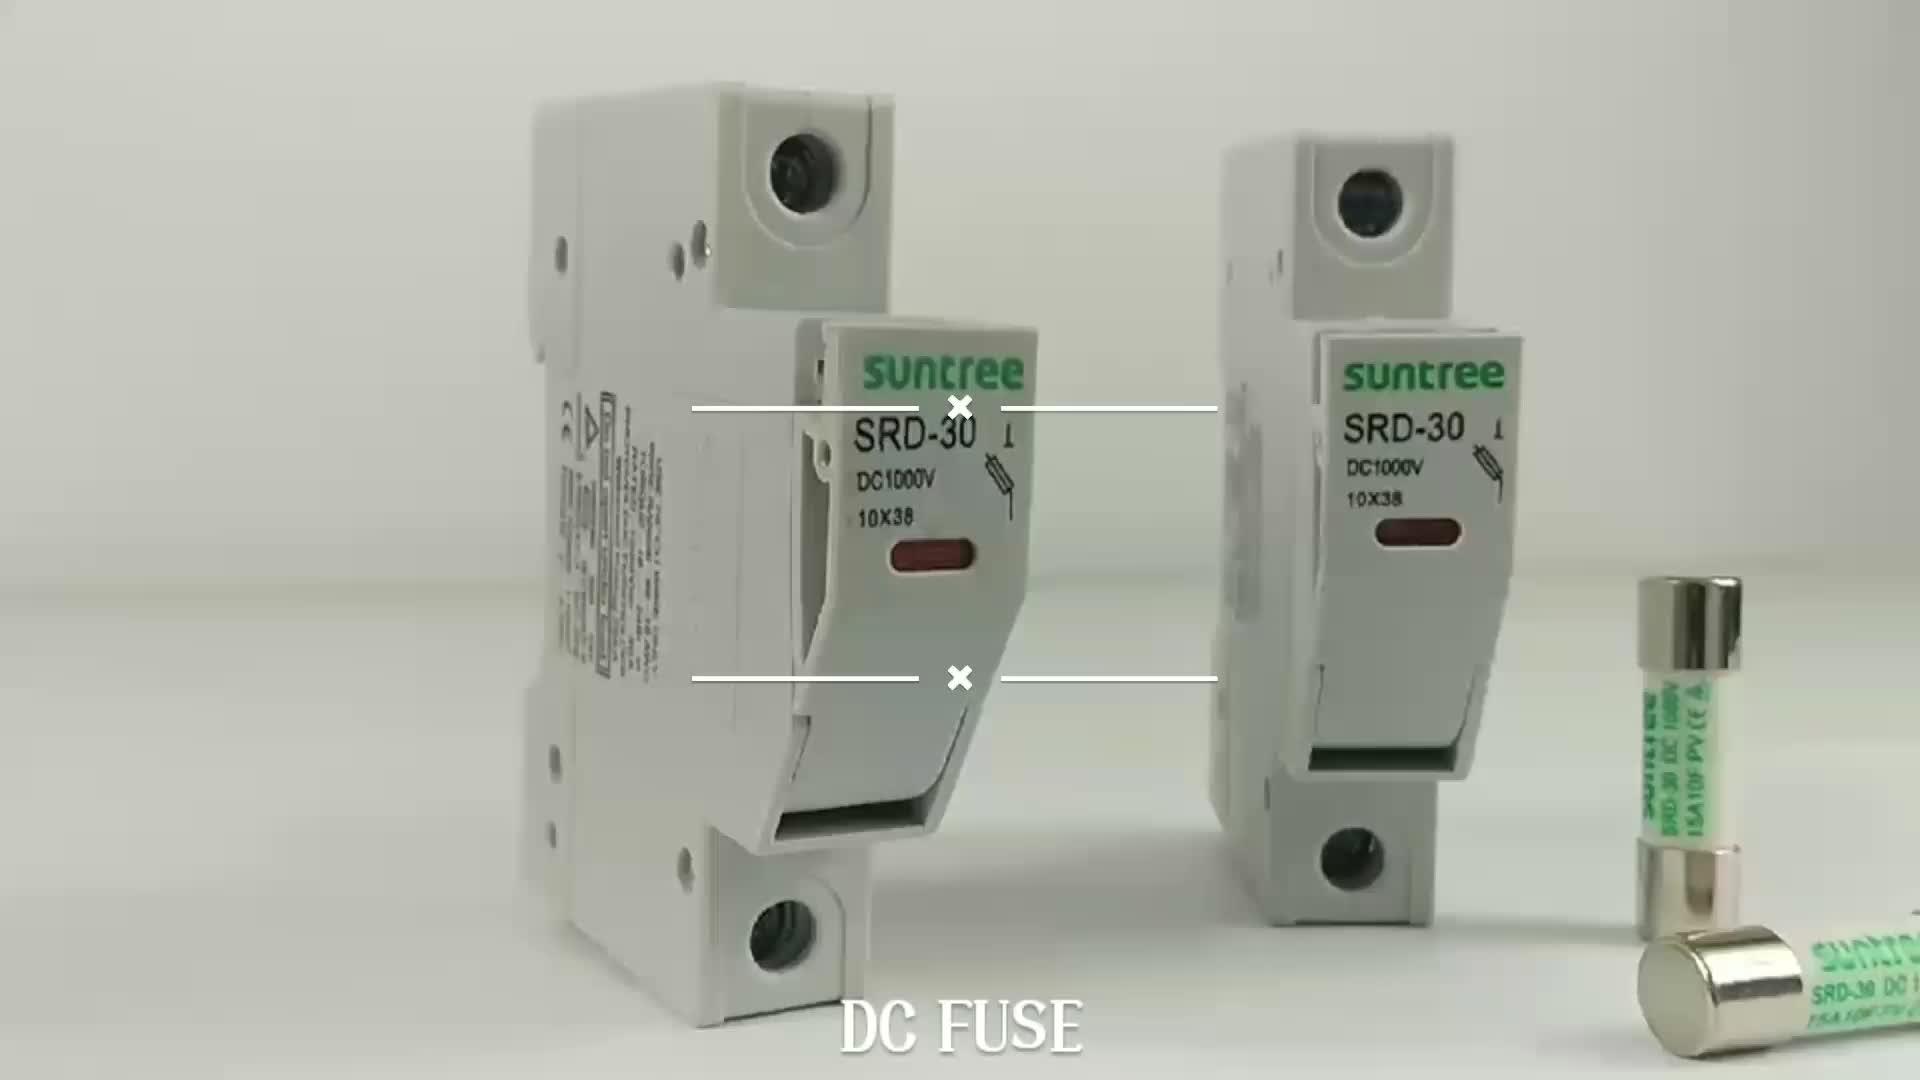 hight resolution of suntree srd 30 series 10x38mm fuse holder for solar pv system 12v solar fuse box solar fuse box